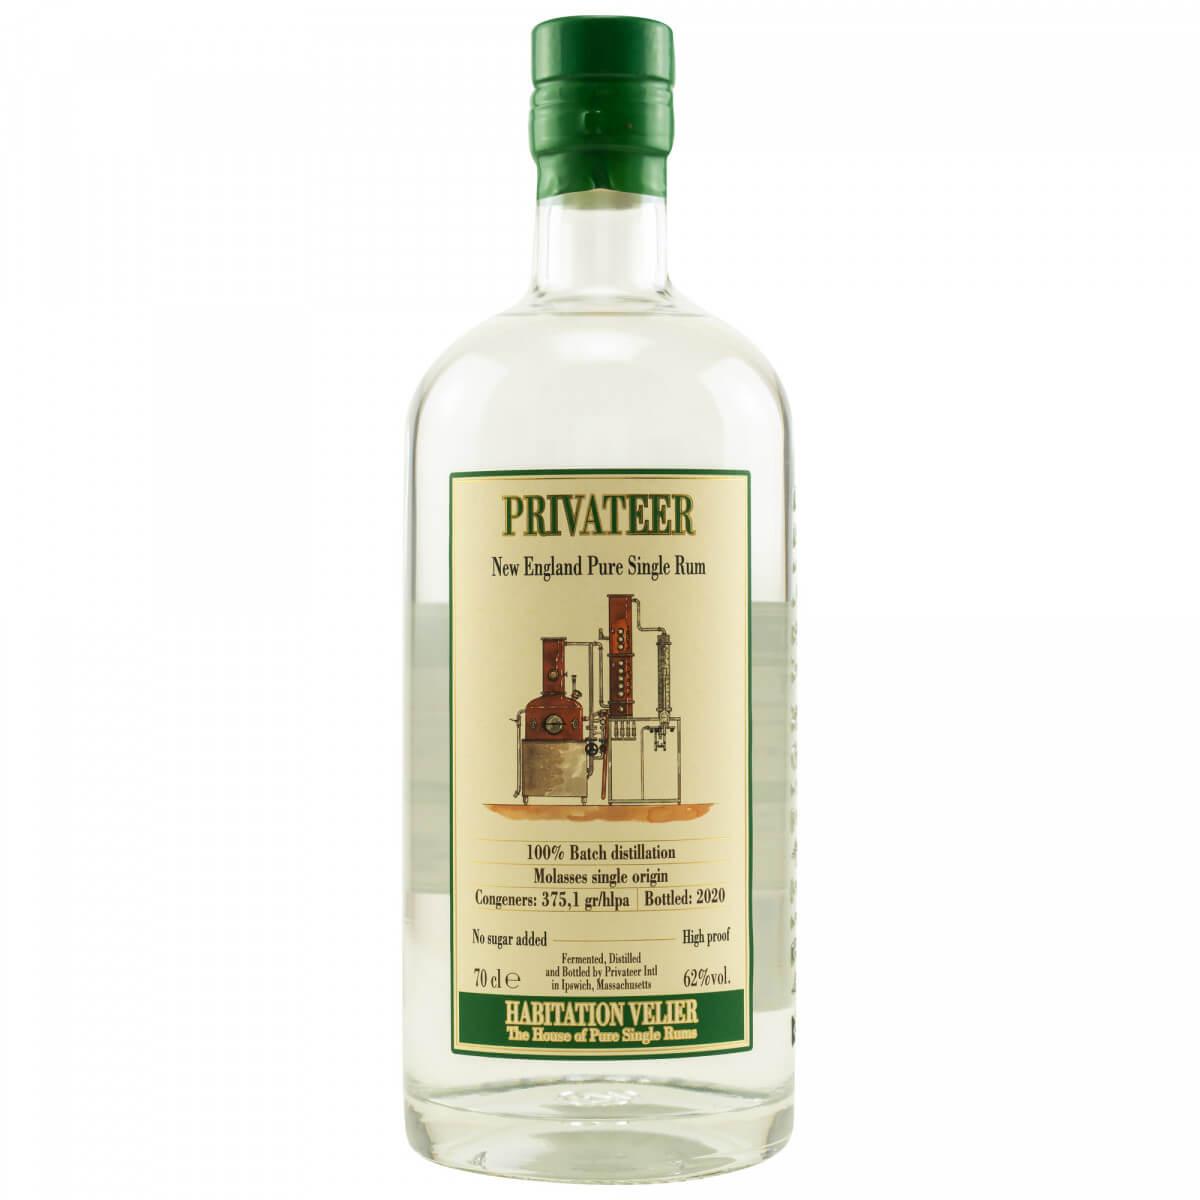 Flasche Privateer 2020 Rum